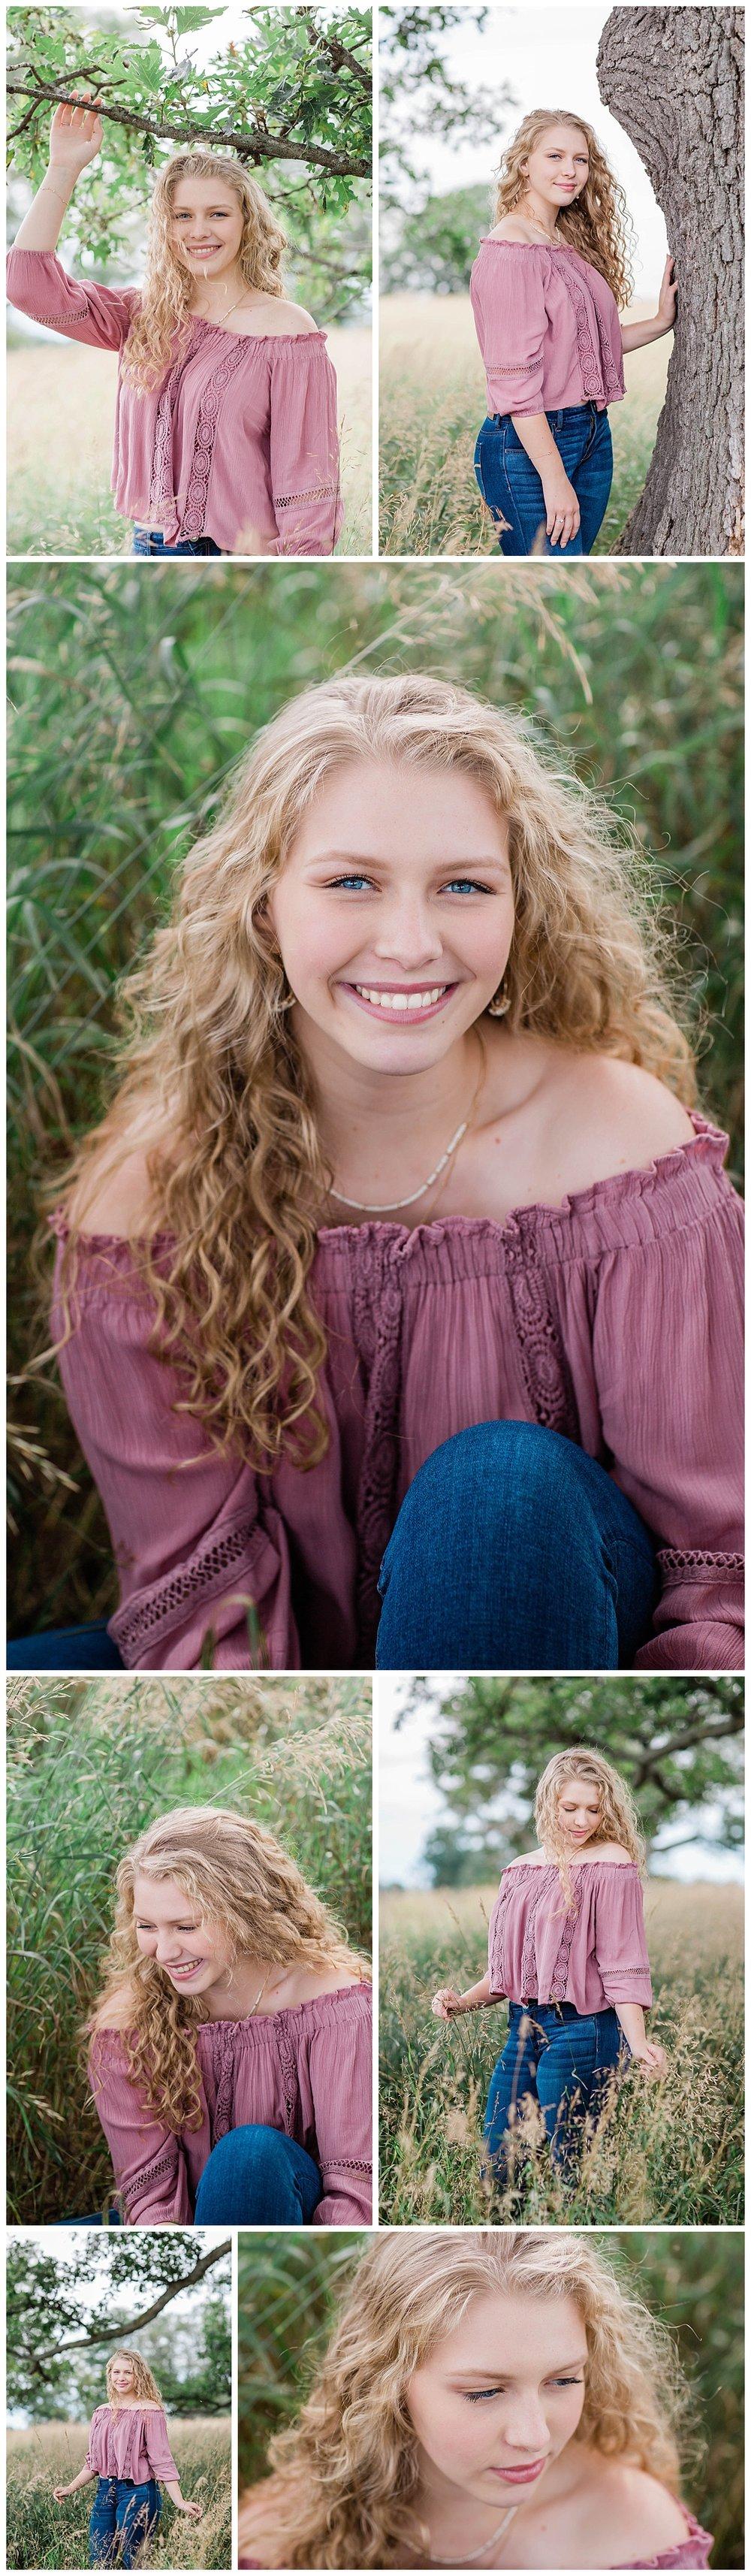 Emily - Class Of 2019-10-2.jpg